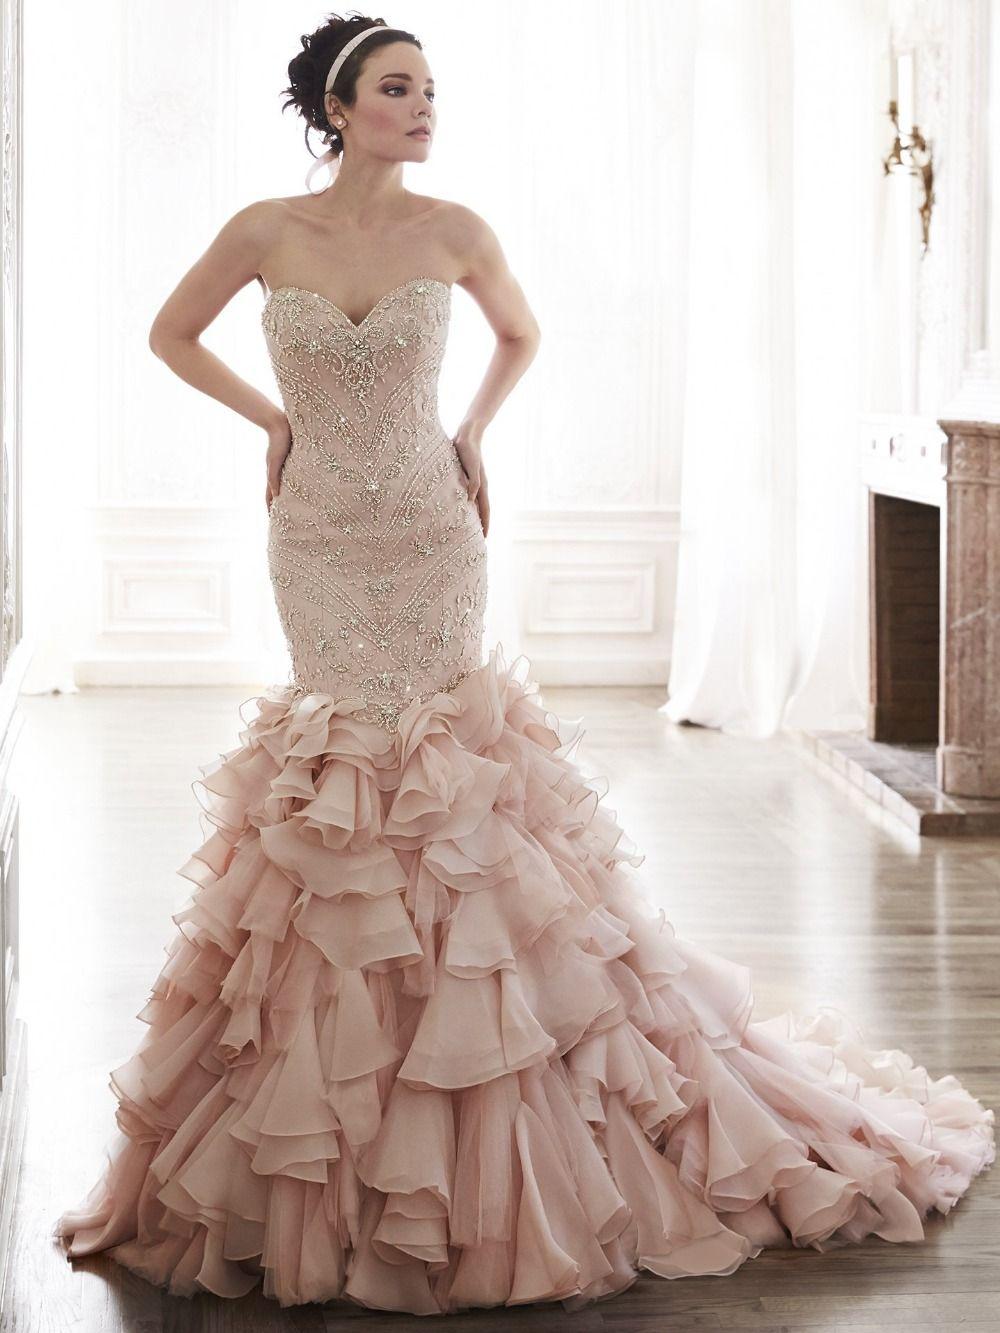 Mermaid ruffle wedding dress  Click to Buy ucuc  Elegnat Pink Mermaid Wedding Dresses Sexy